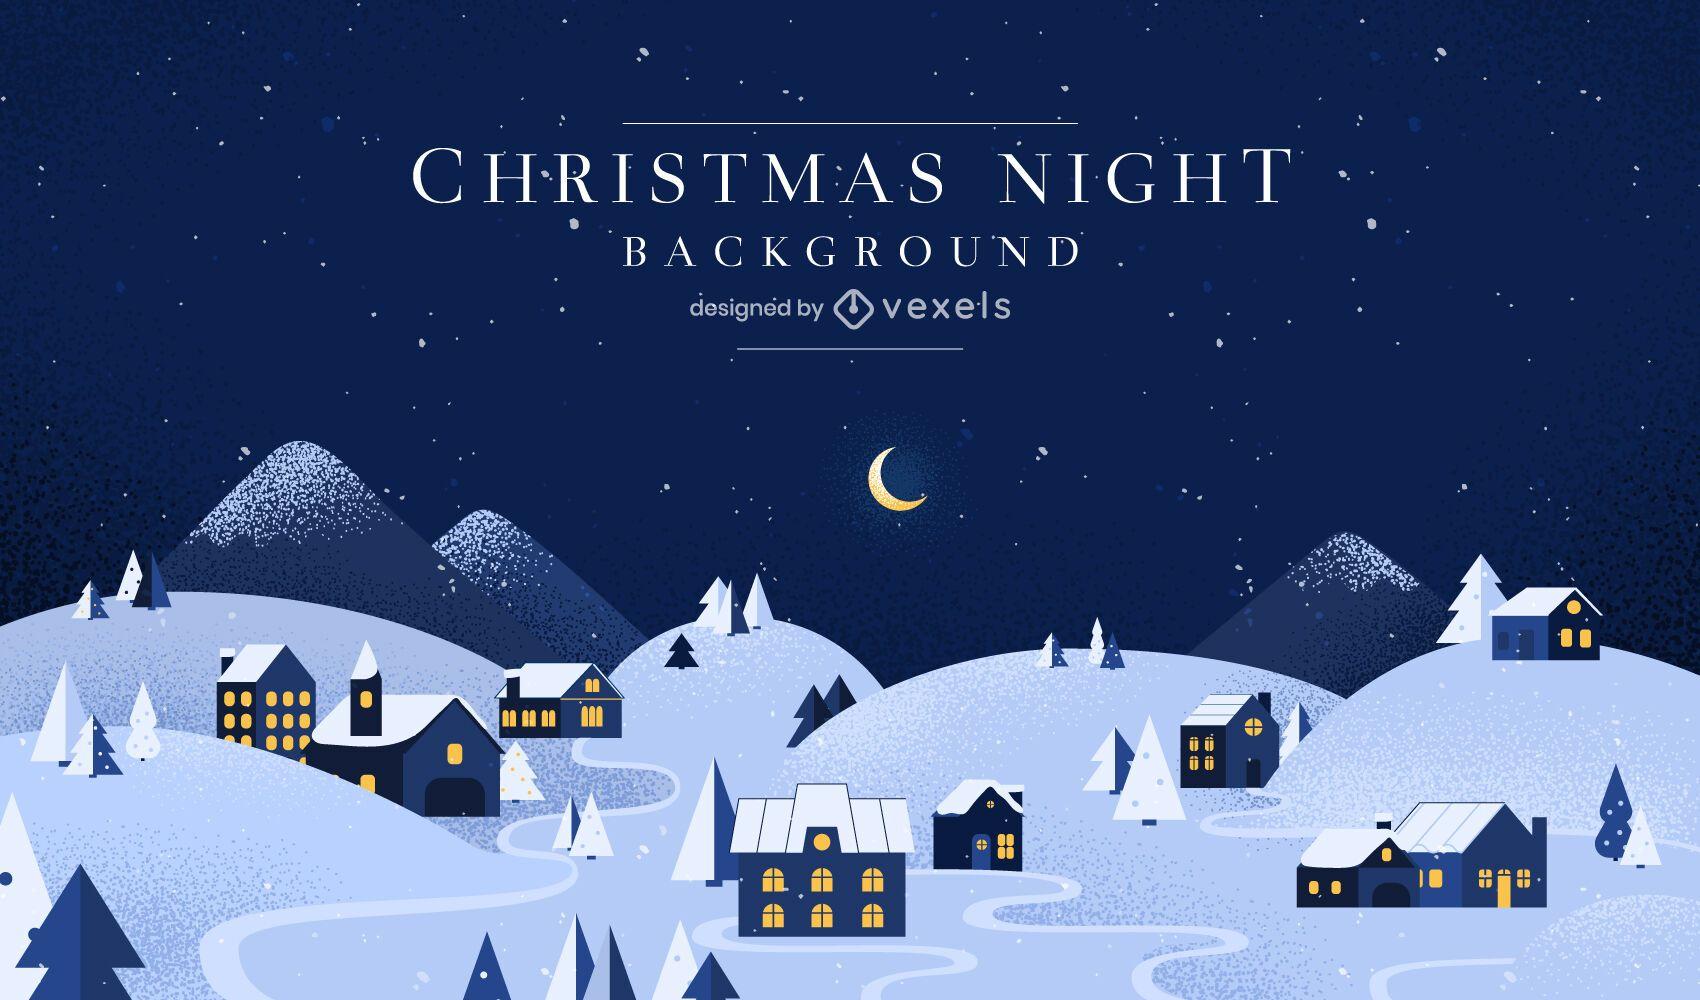 Christmas night background design